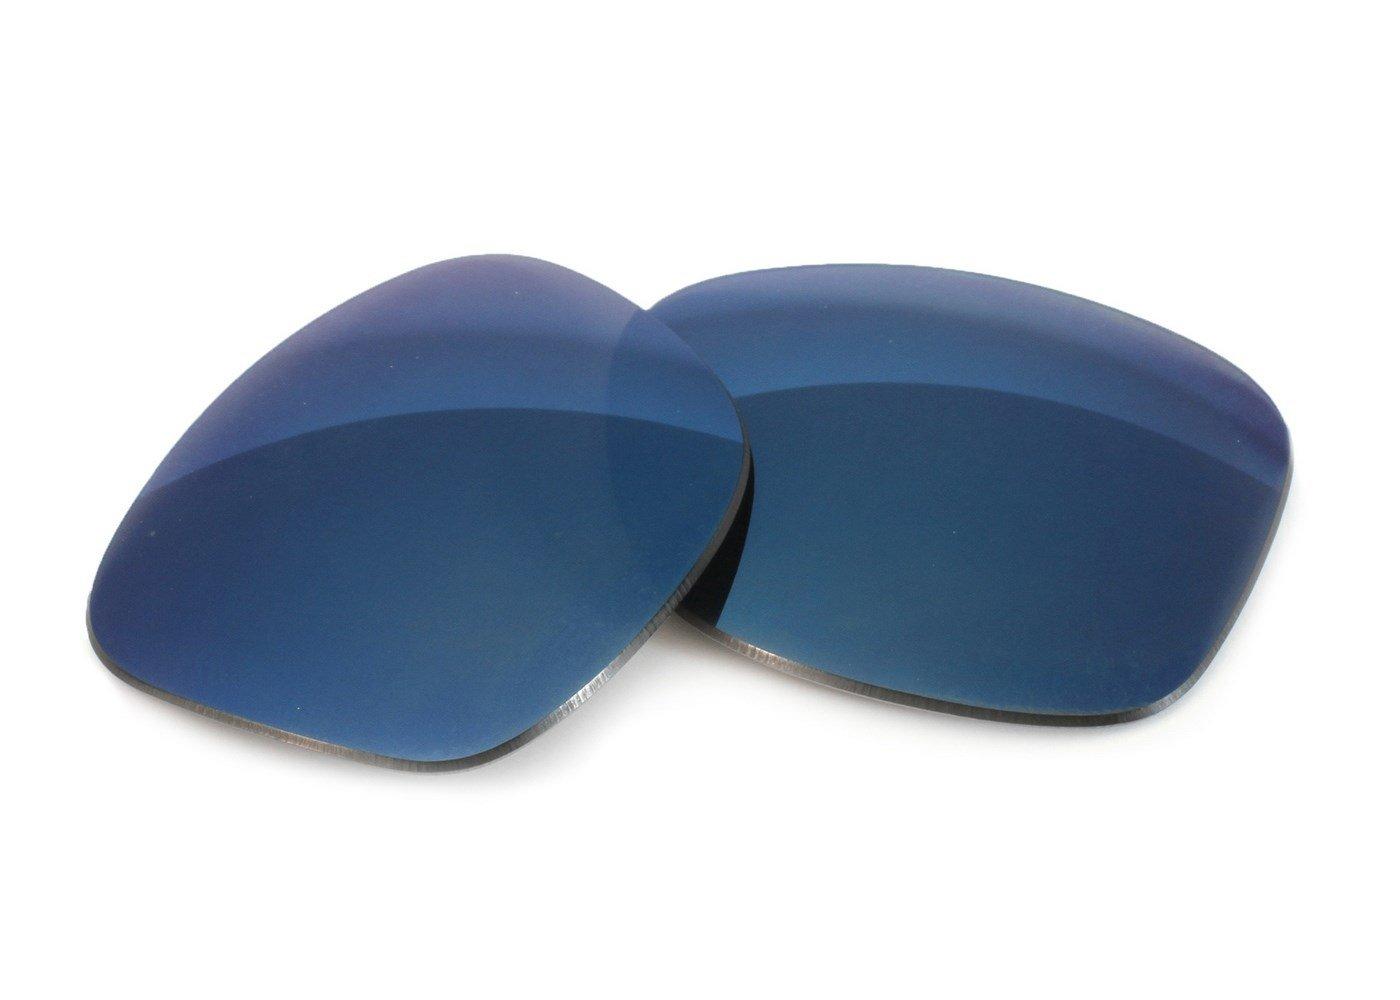 Fuse Lenses for Costa Del Mar Pawleys - Midnight Blue Mirror Polarized